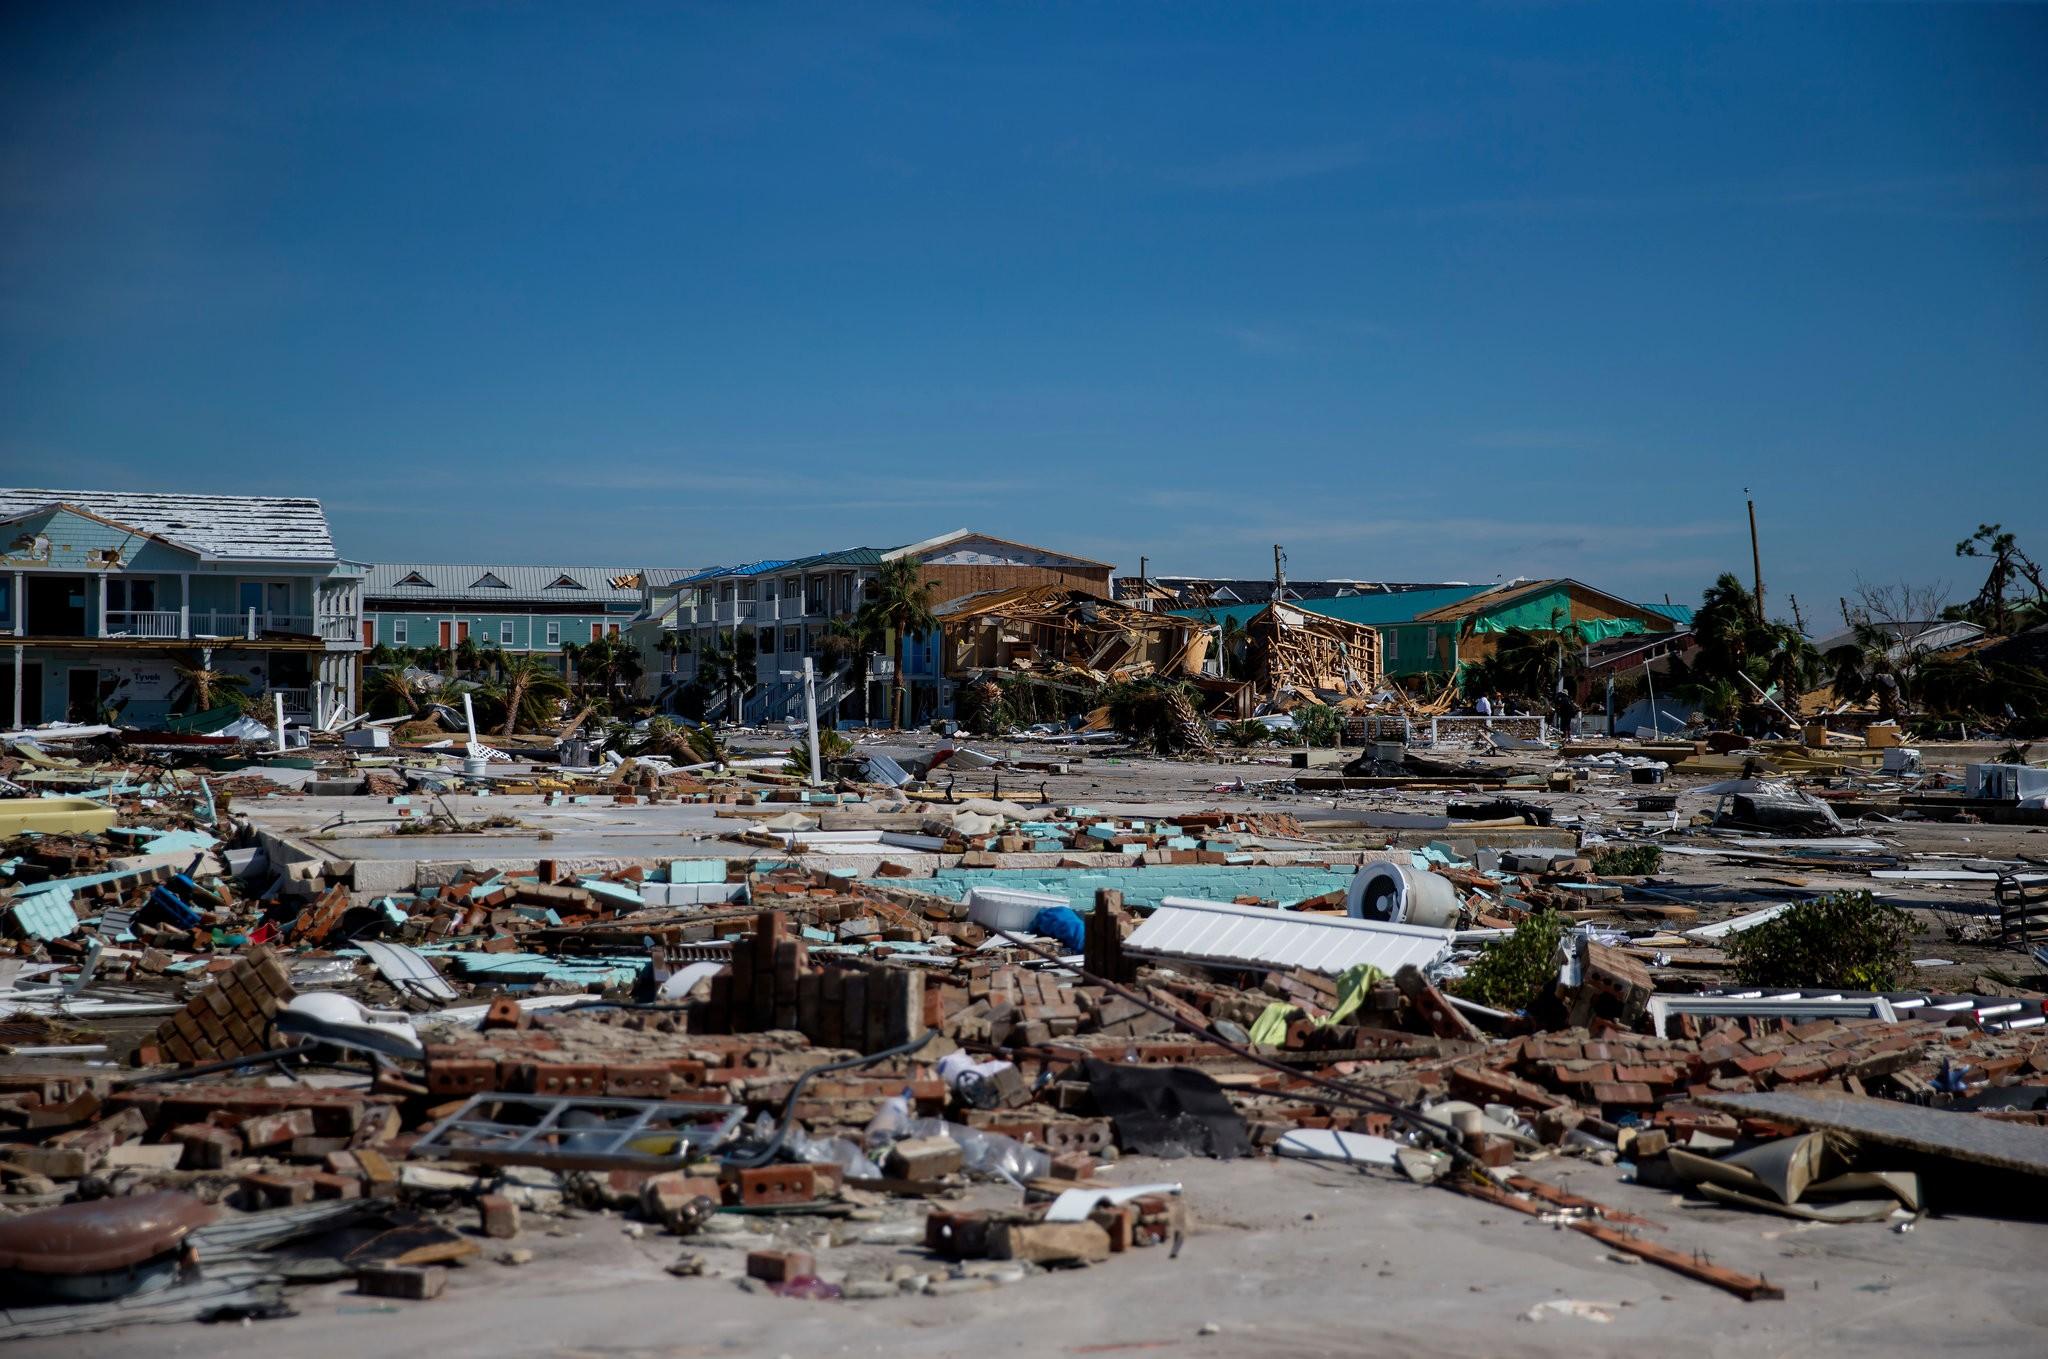 Hurricane aftermath: 'Catastrophic' damage; economic losses